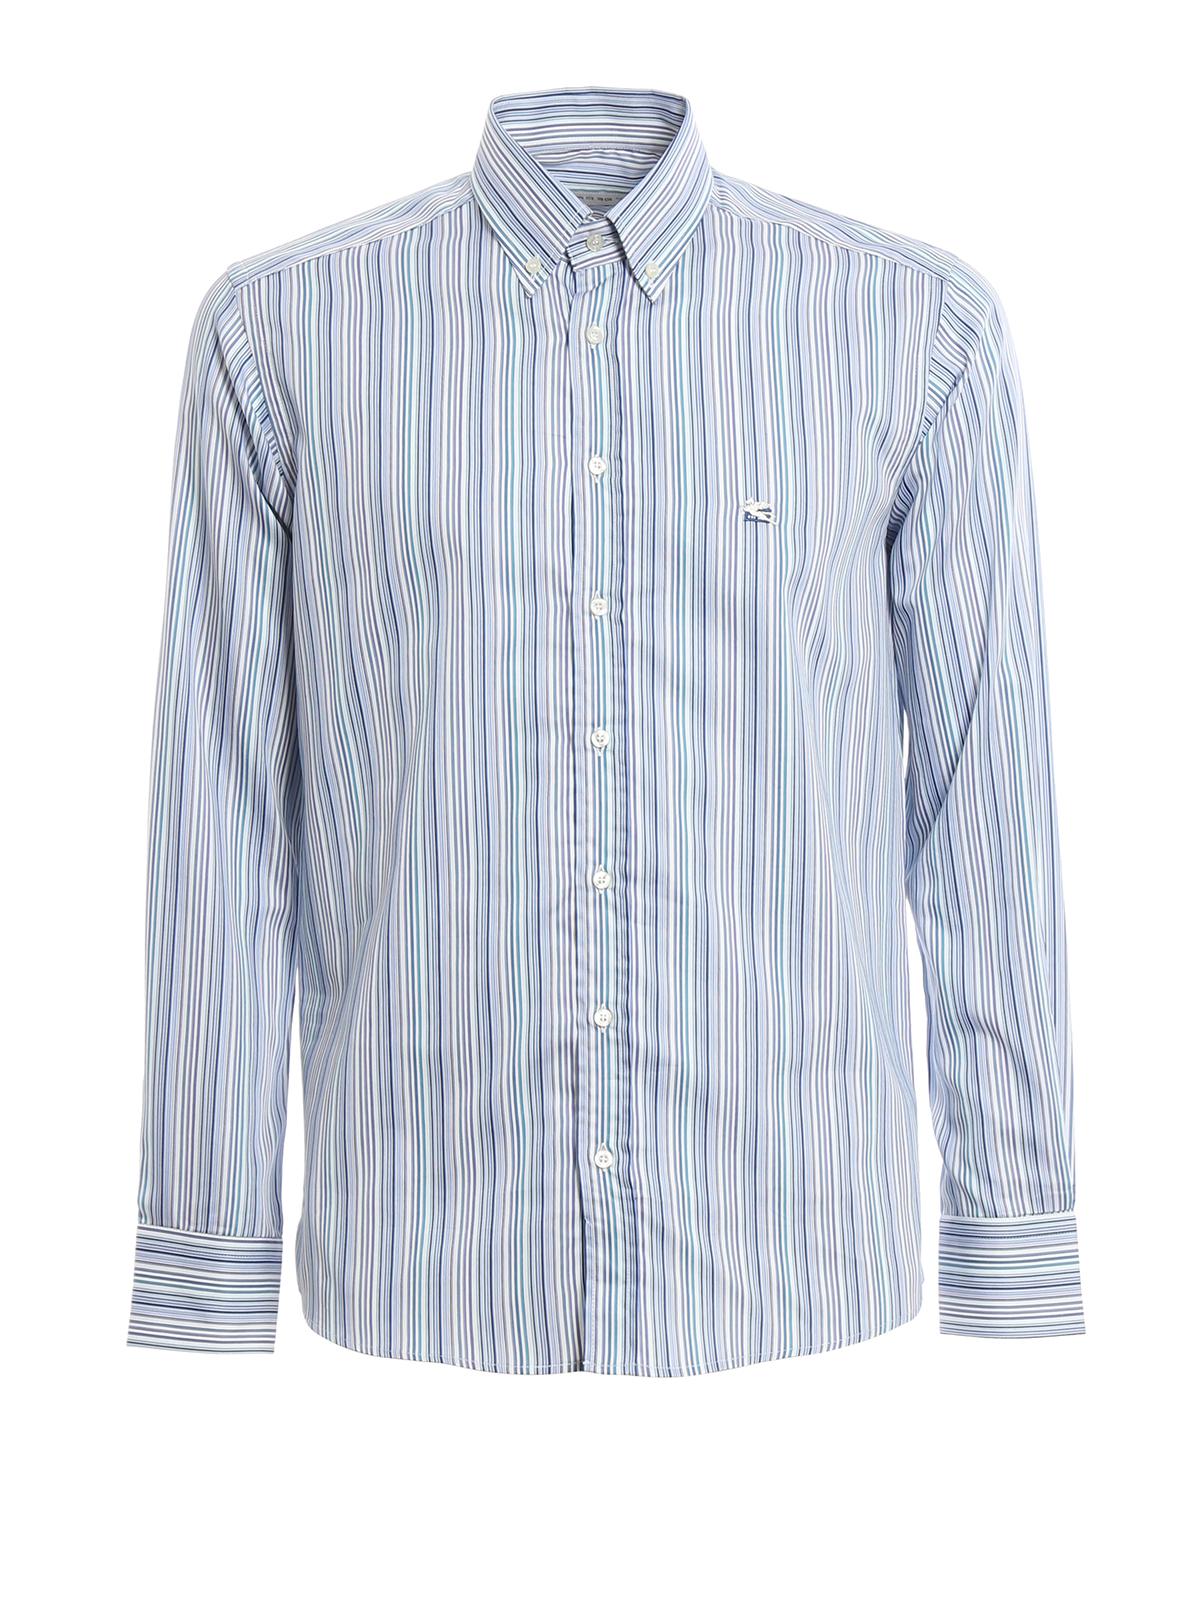 Striped Cotton Button Down Shirt By Etro Shirts Ikrix